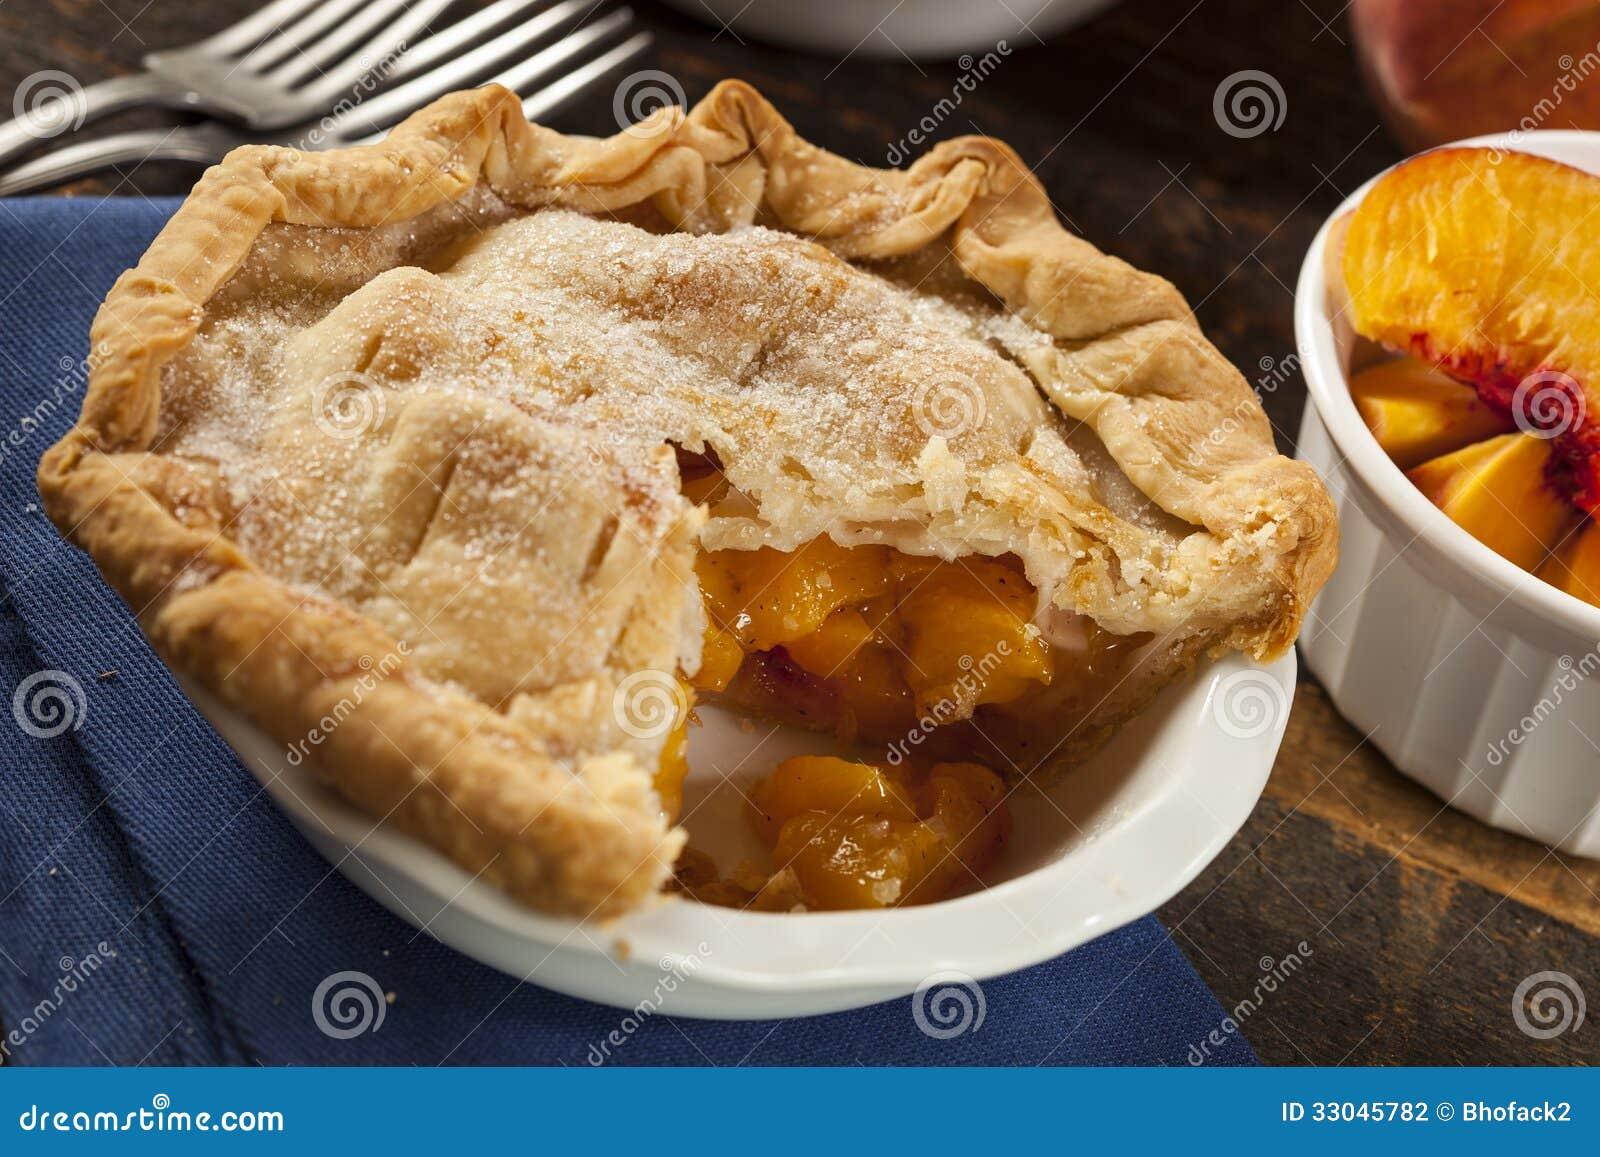 Mini Peach Pie Dessert Stock Photography - Image: 33045782